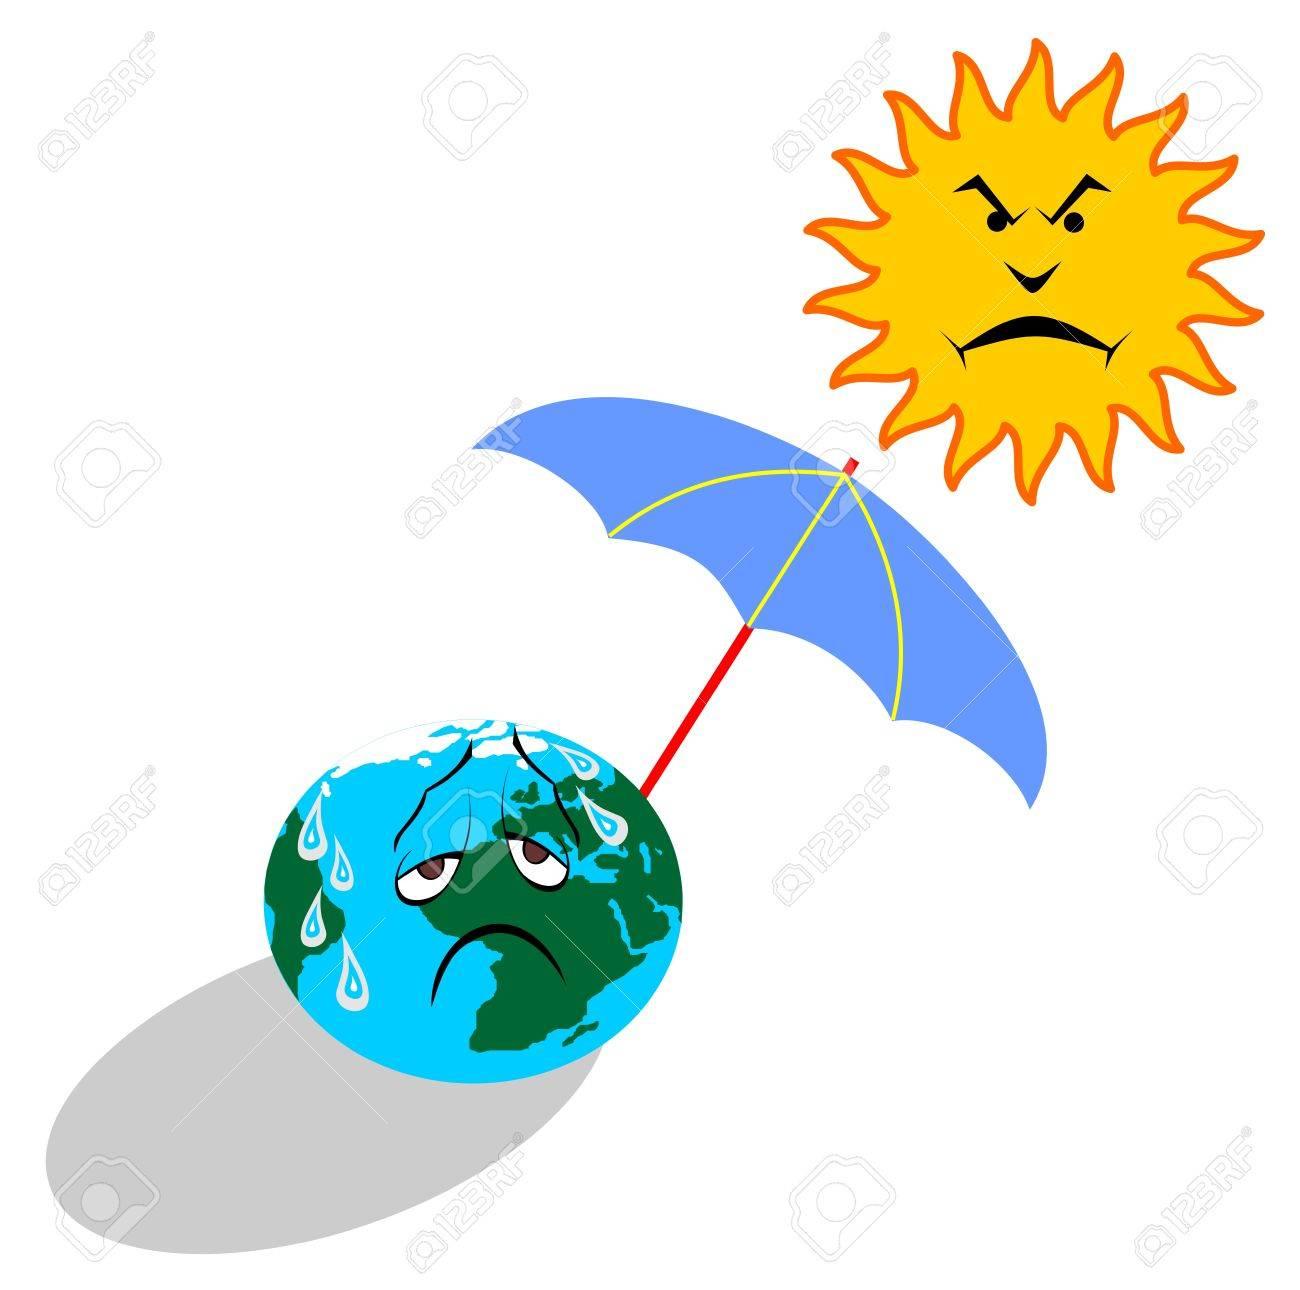 global warming Stock Vector - 5862295